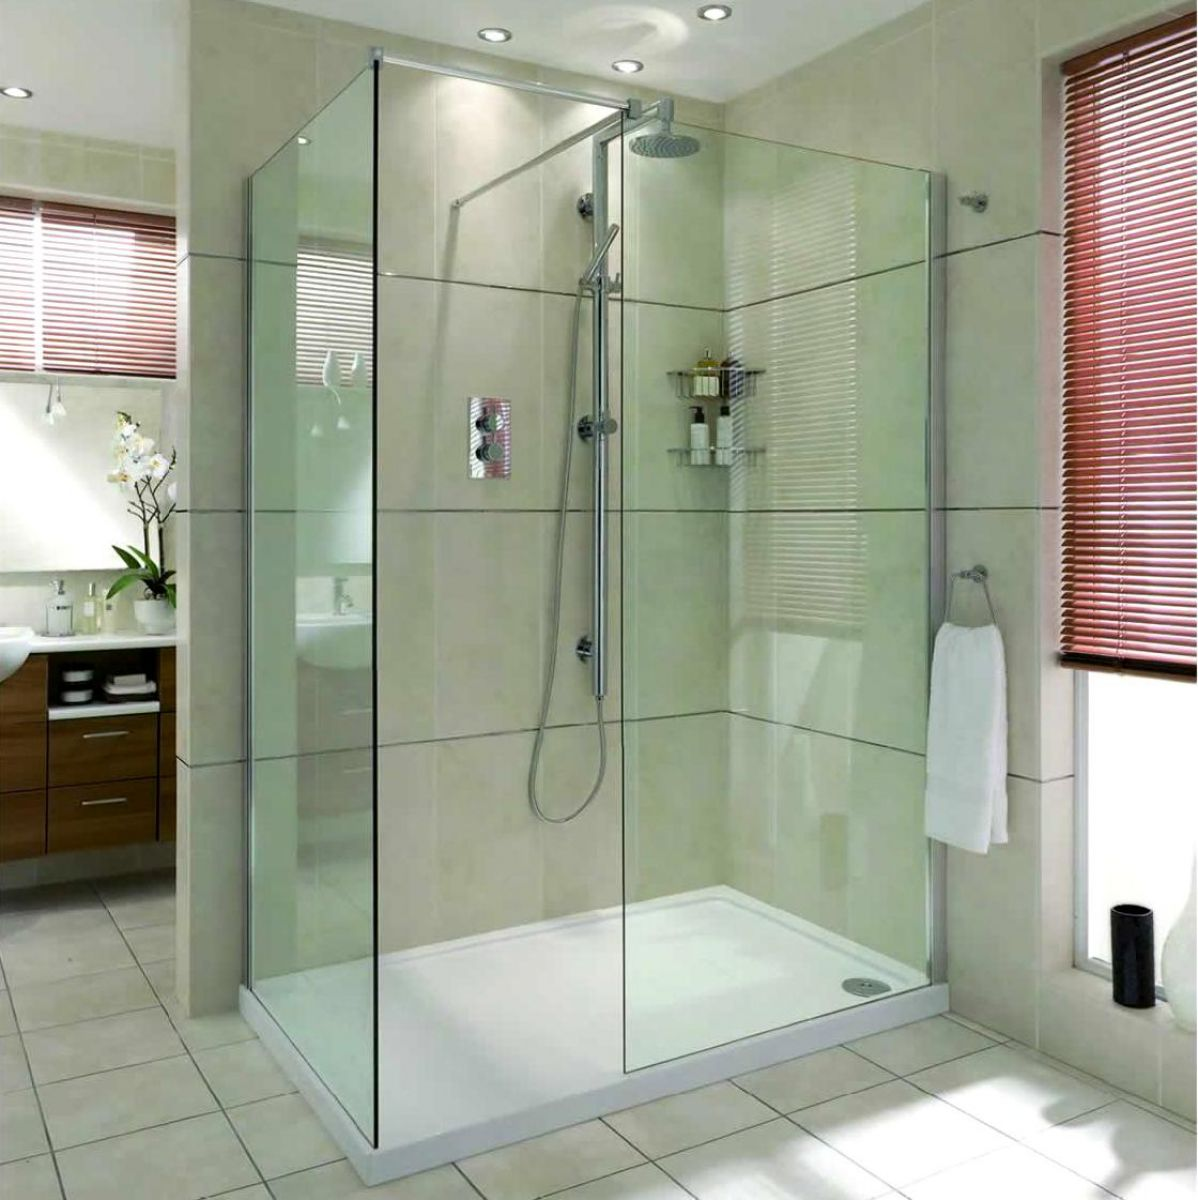 Aqata spectra walk in corner shower enclosure sp405 uk bathrooms - Walk in showers ...